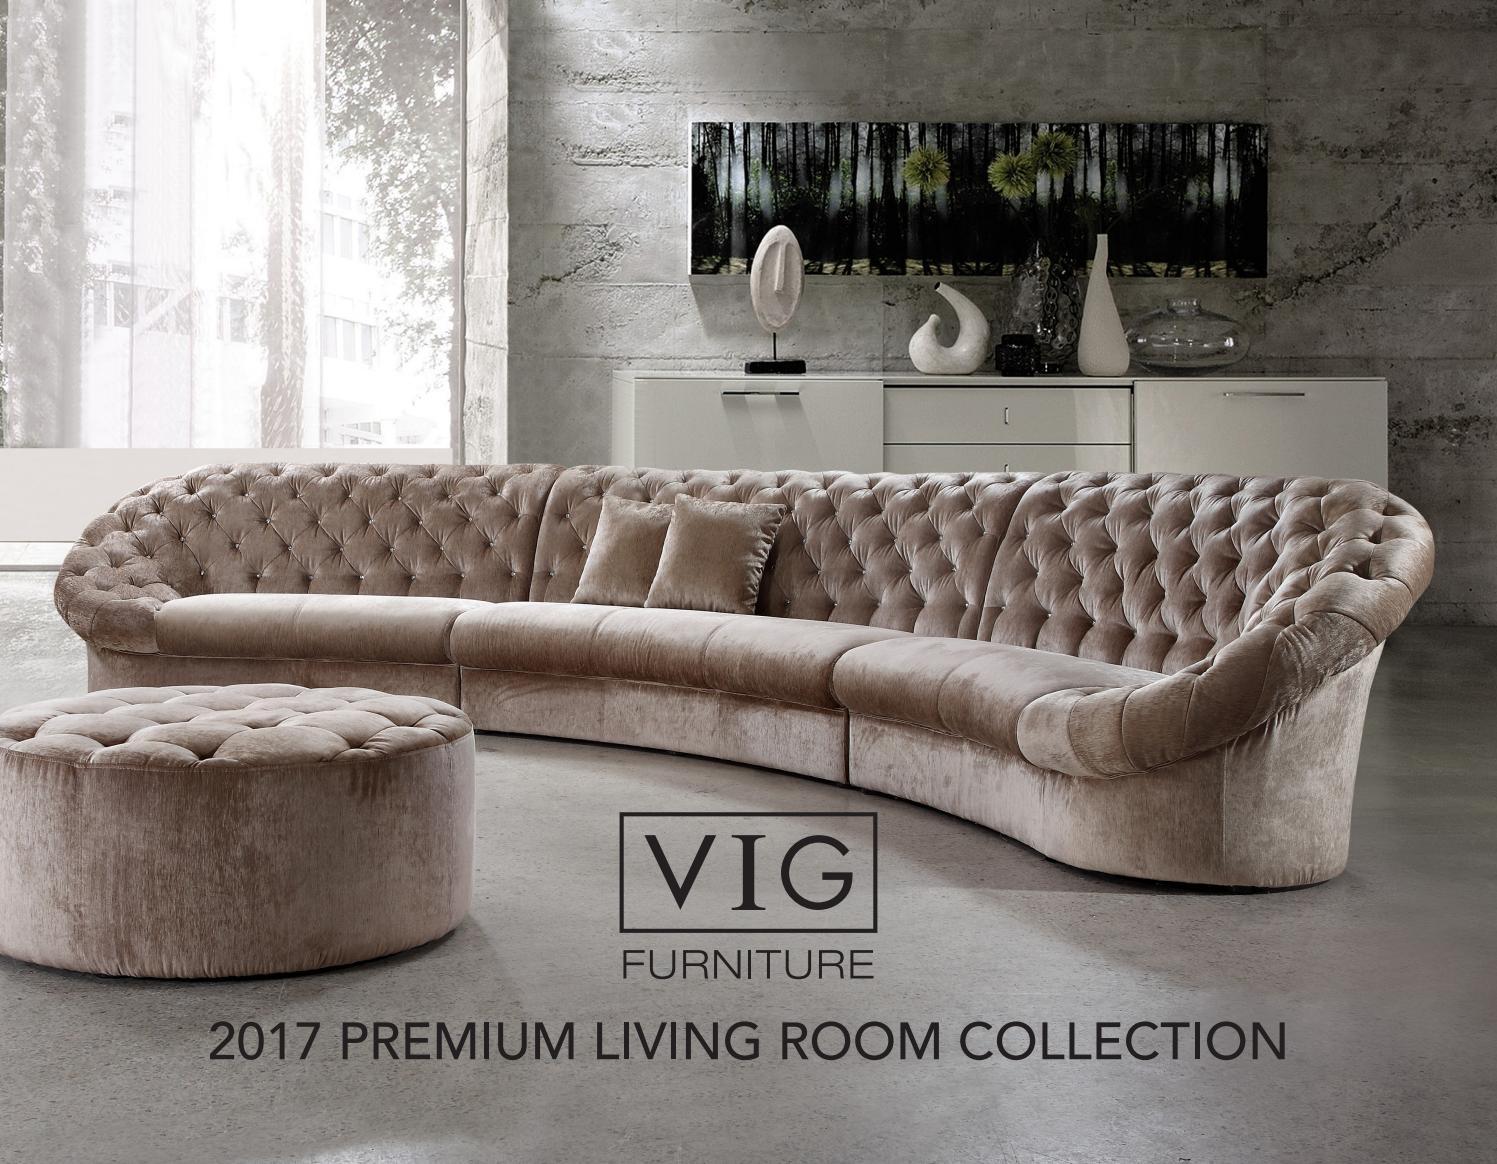 Vig Furniture 2017 Premium Living Room Collection By Vig Furniture